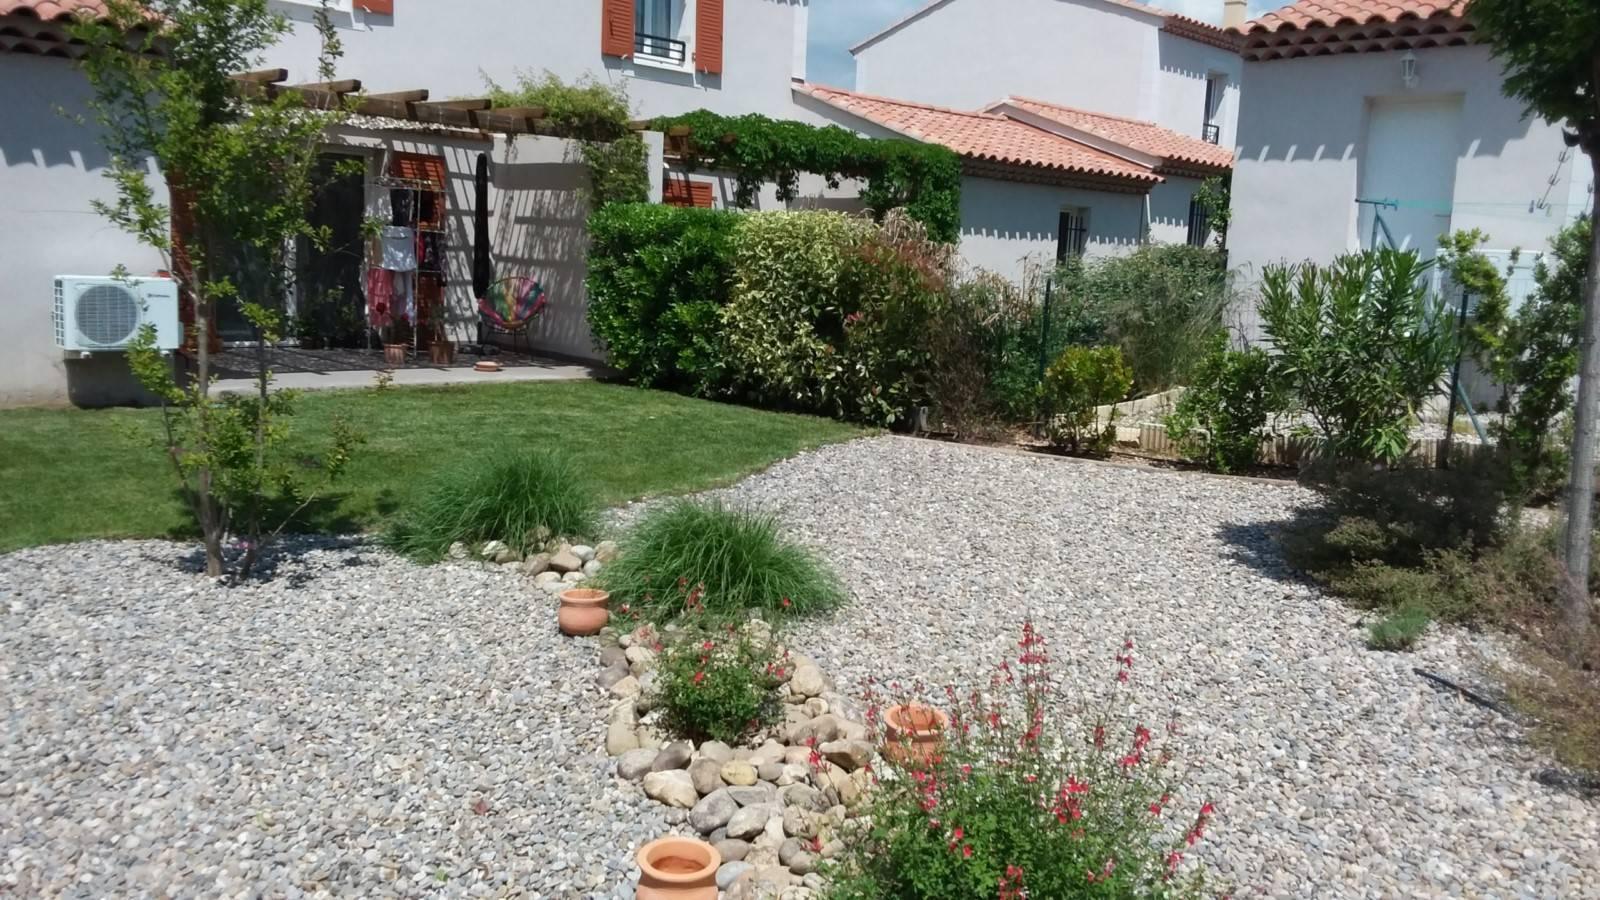 Amenagement D'un Petit Jardin Méditerranéen Devant Maison ... concernant Amenagement Petit Jardin Mediterraneen